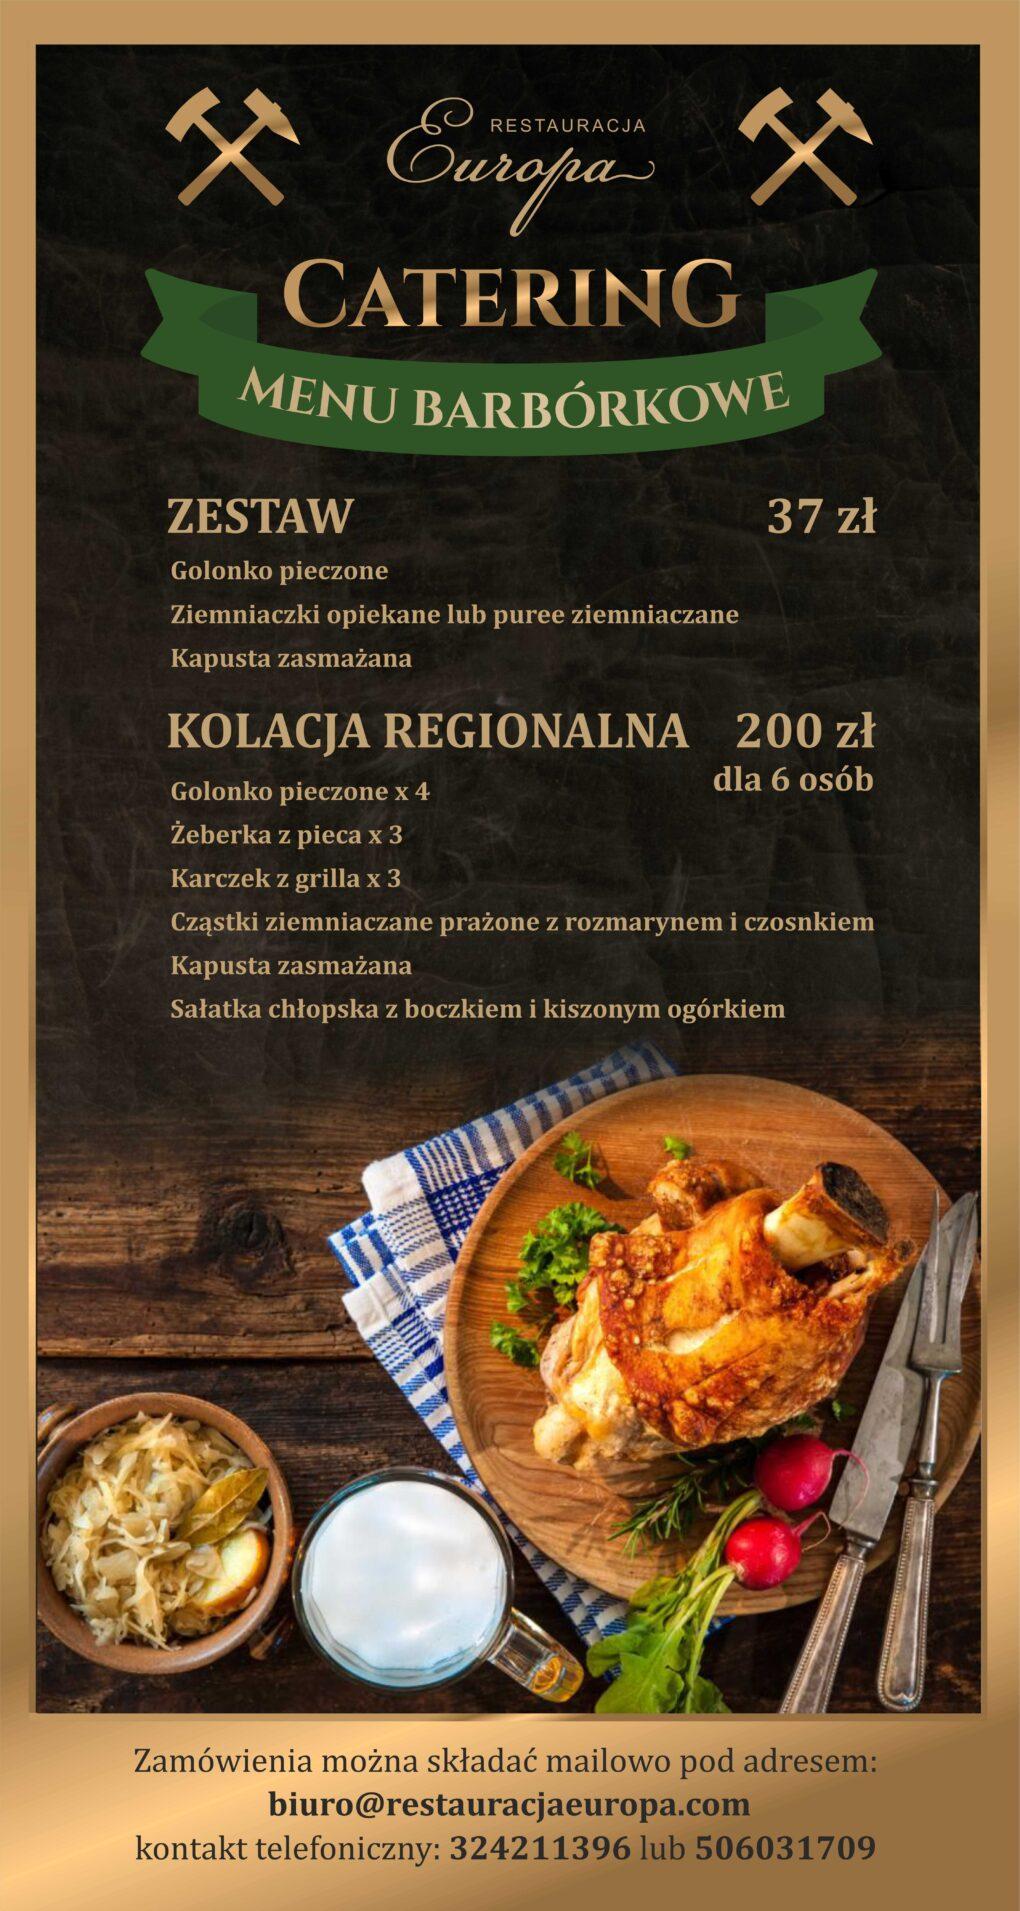 Catering Menu Barbórkowe 2020   Restauracja Europa Rybnik